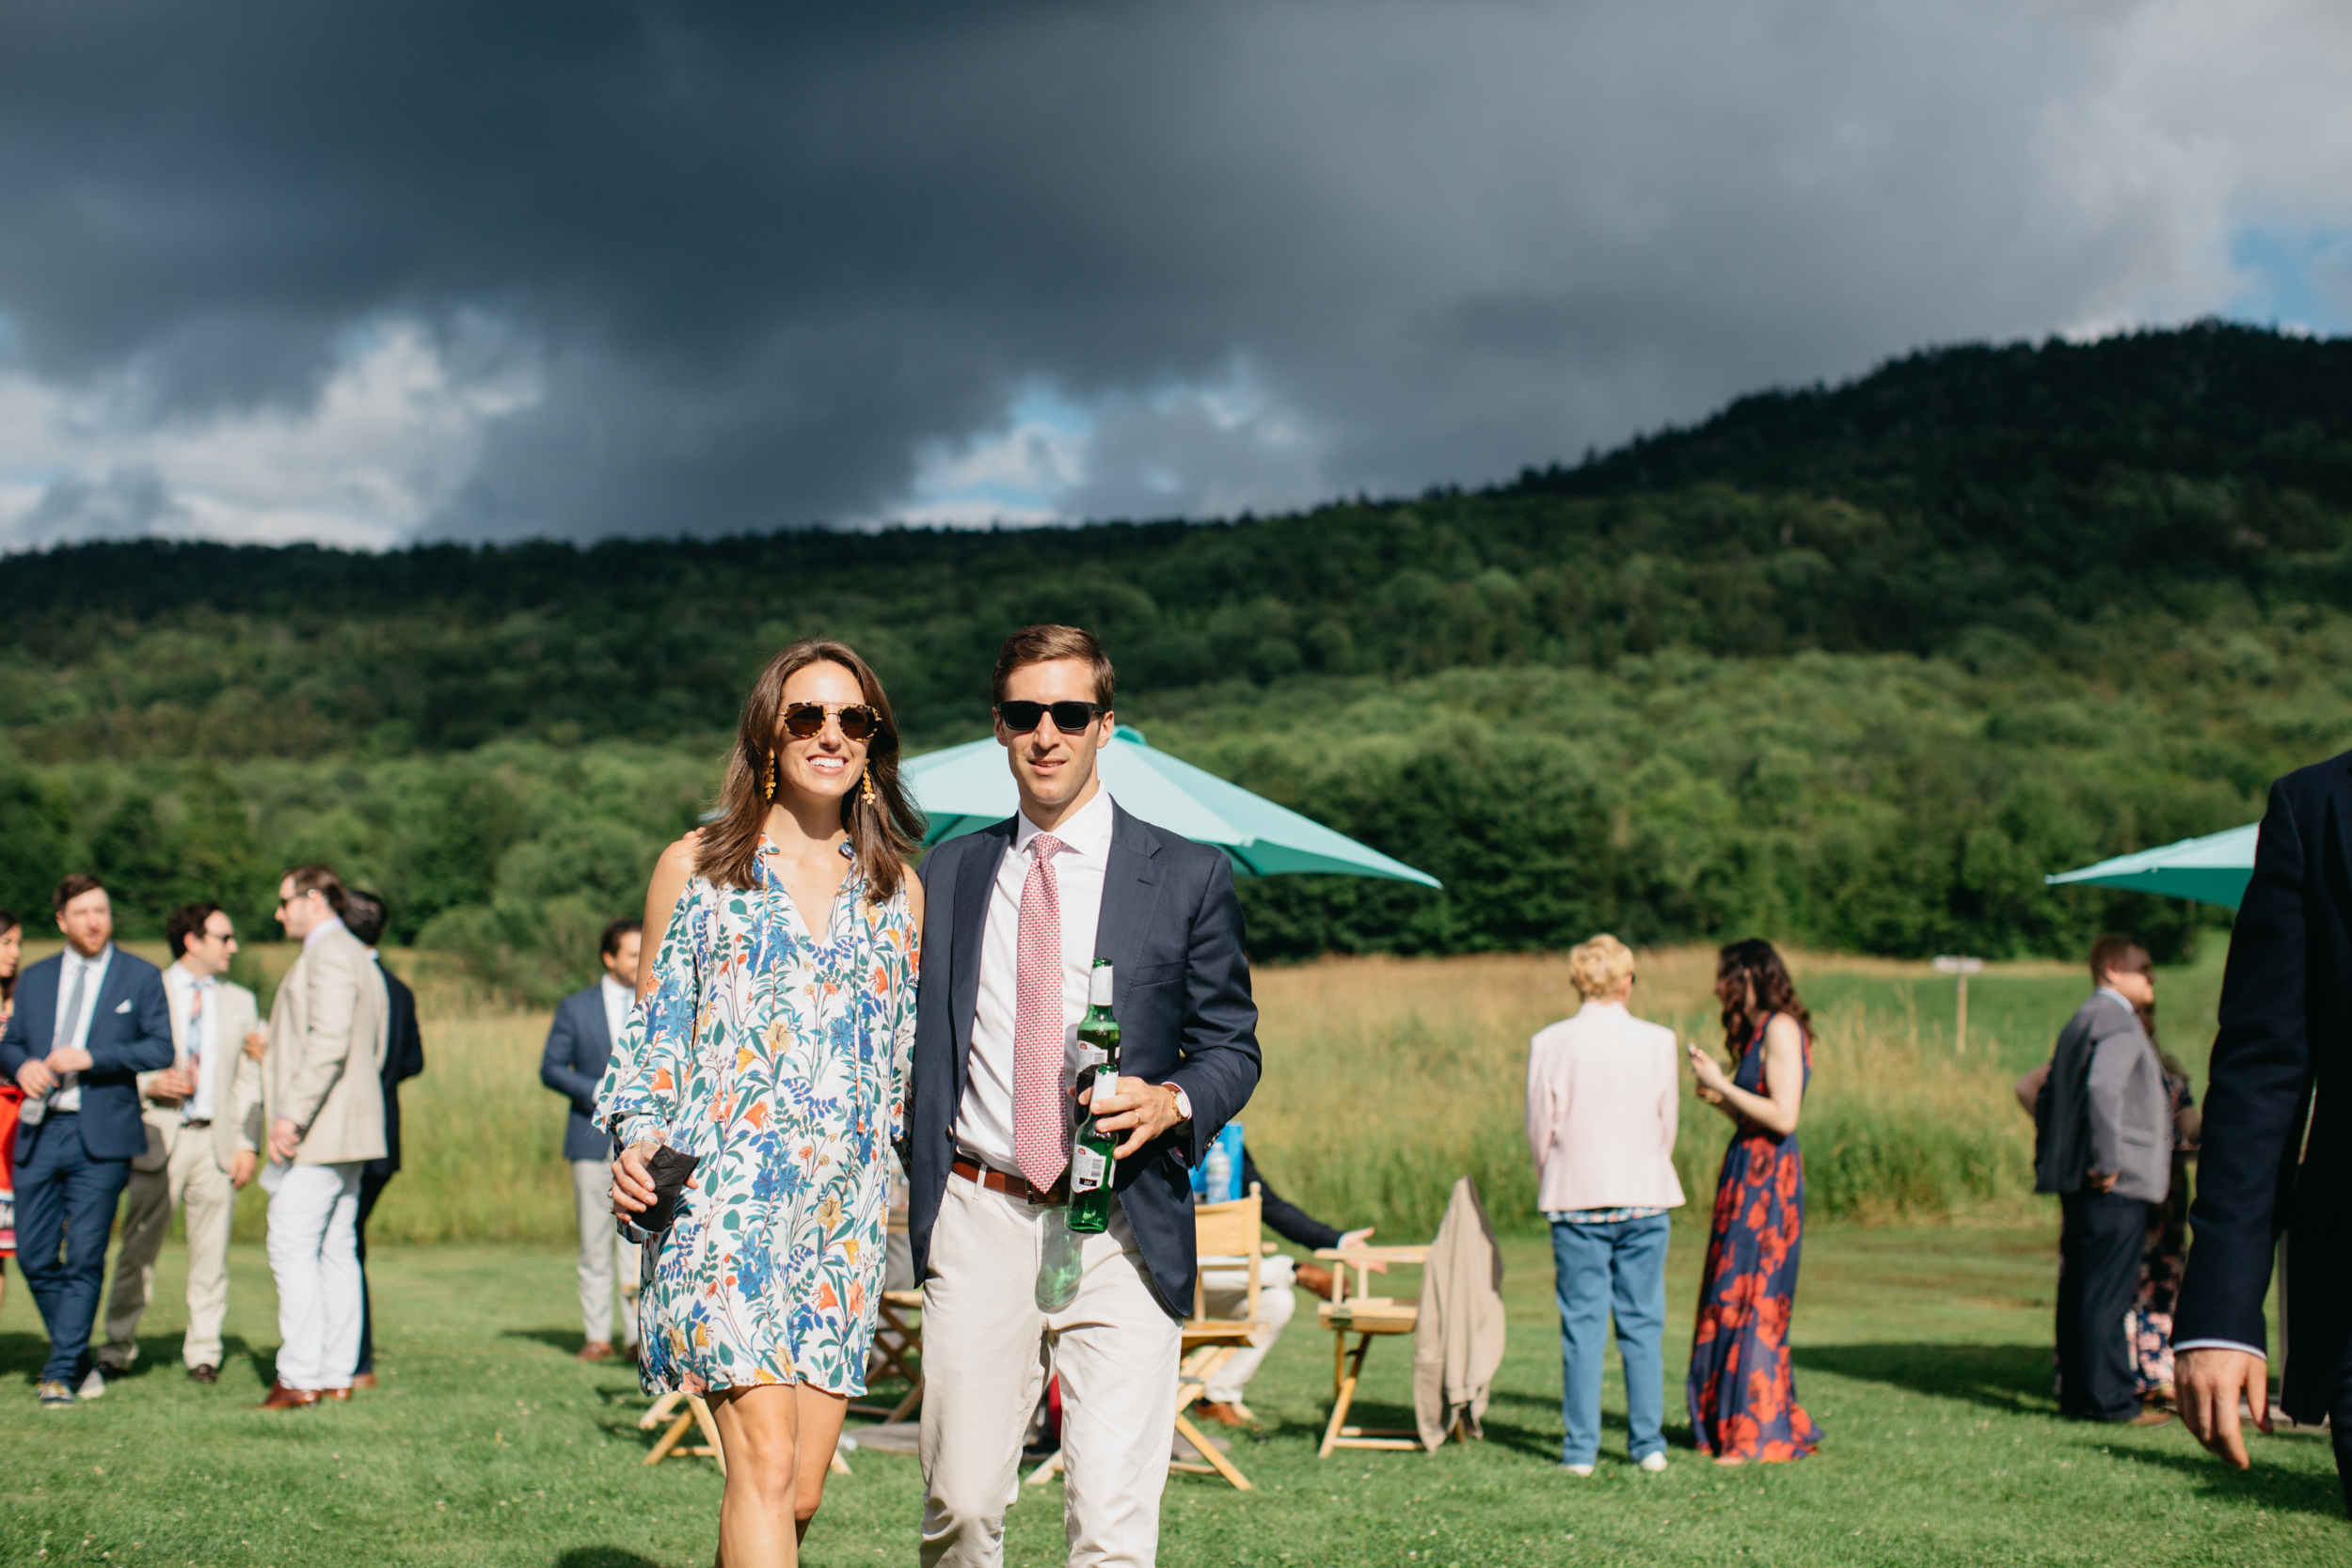 Karen_Alex_Bliss_ridge_farm_Vermont_wedding025.jpg